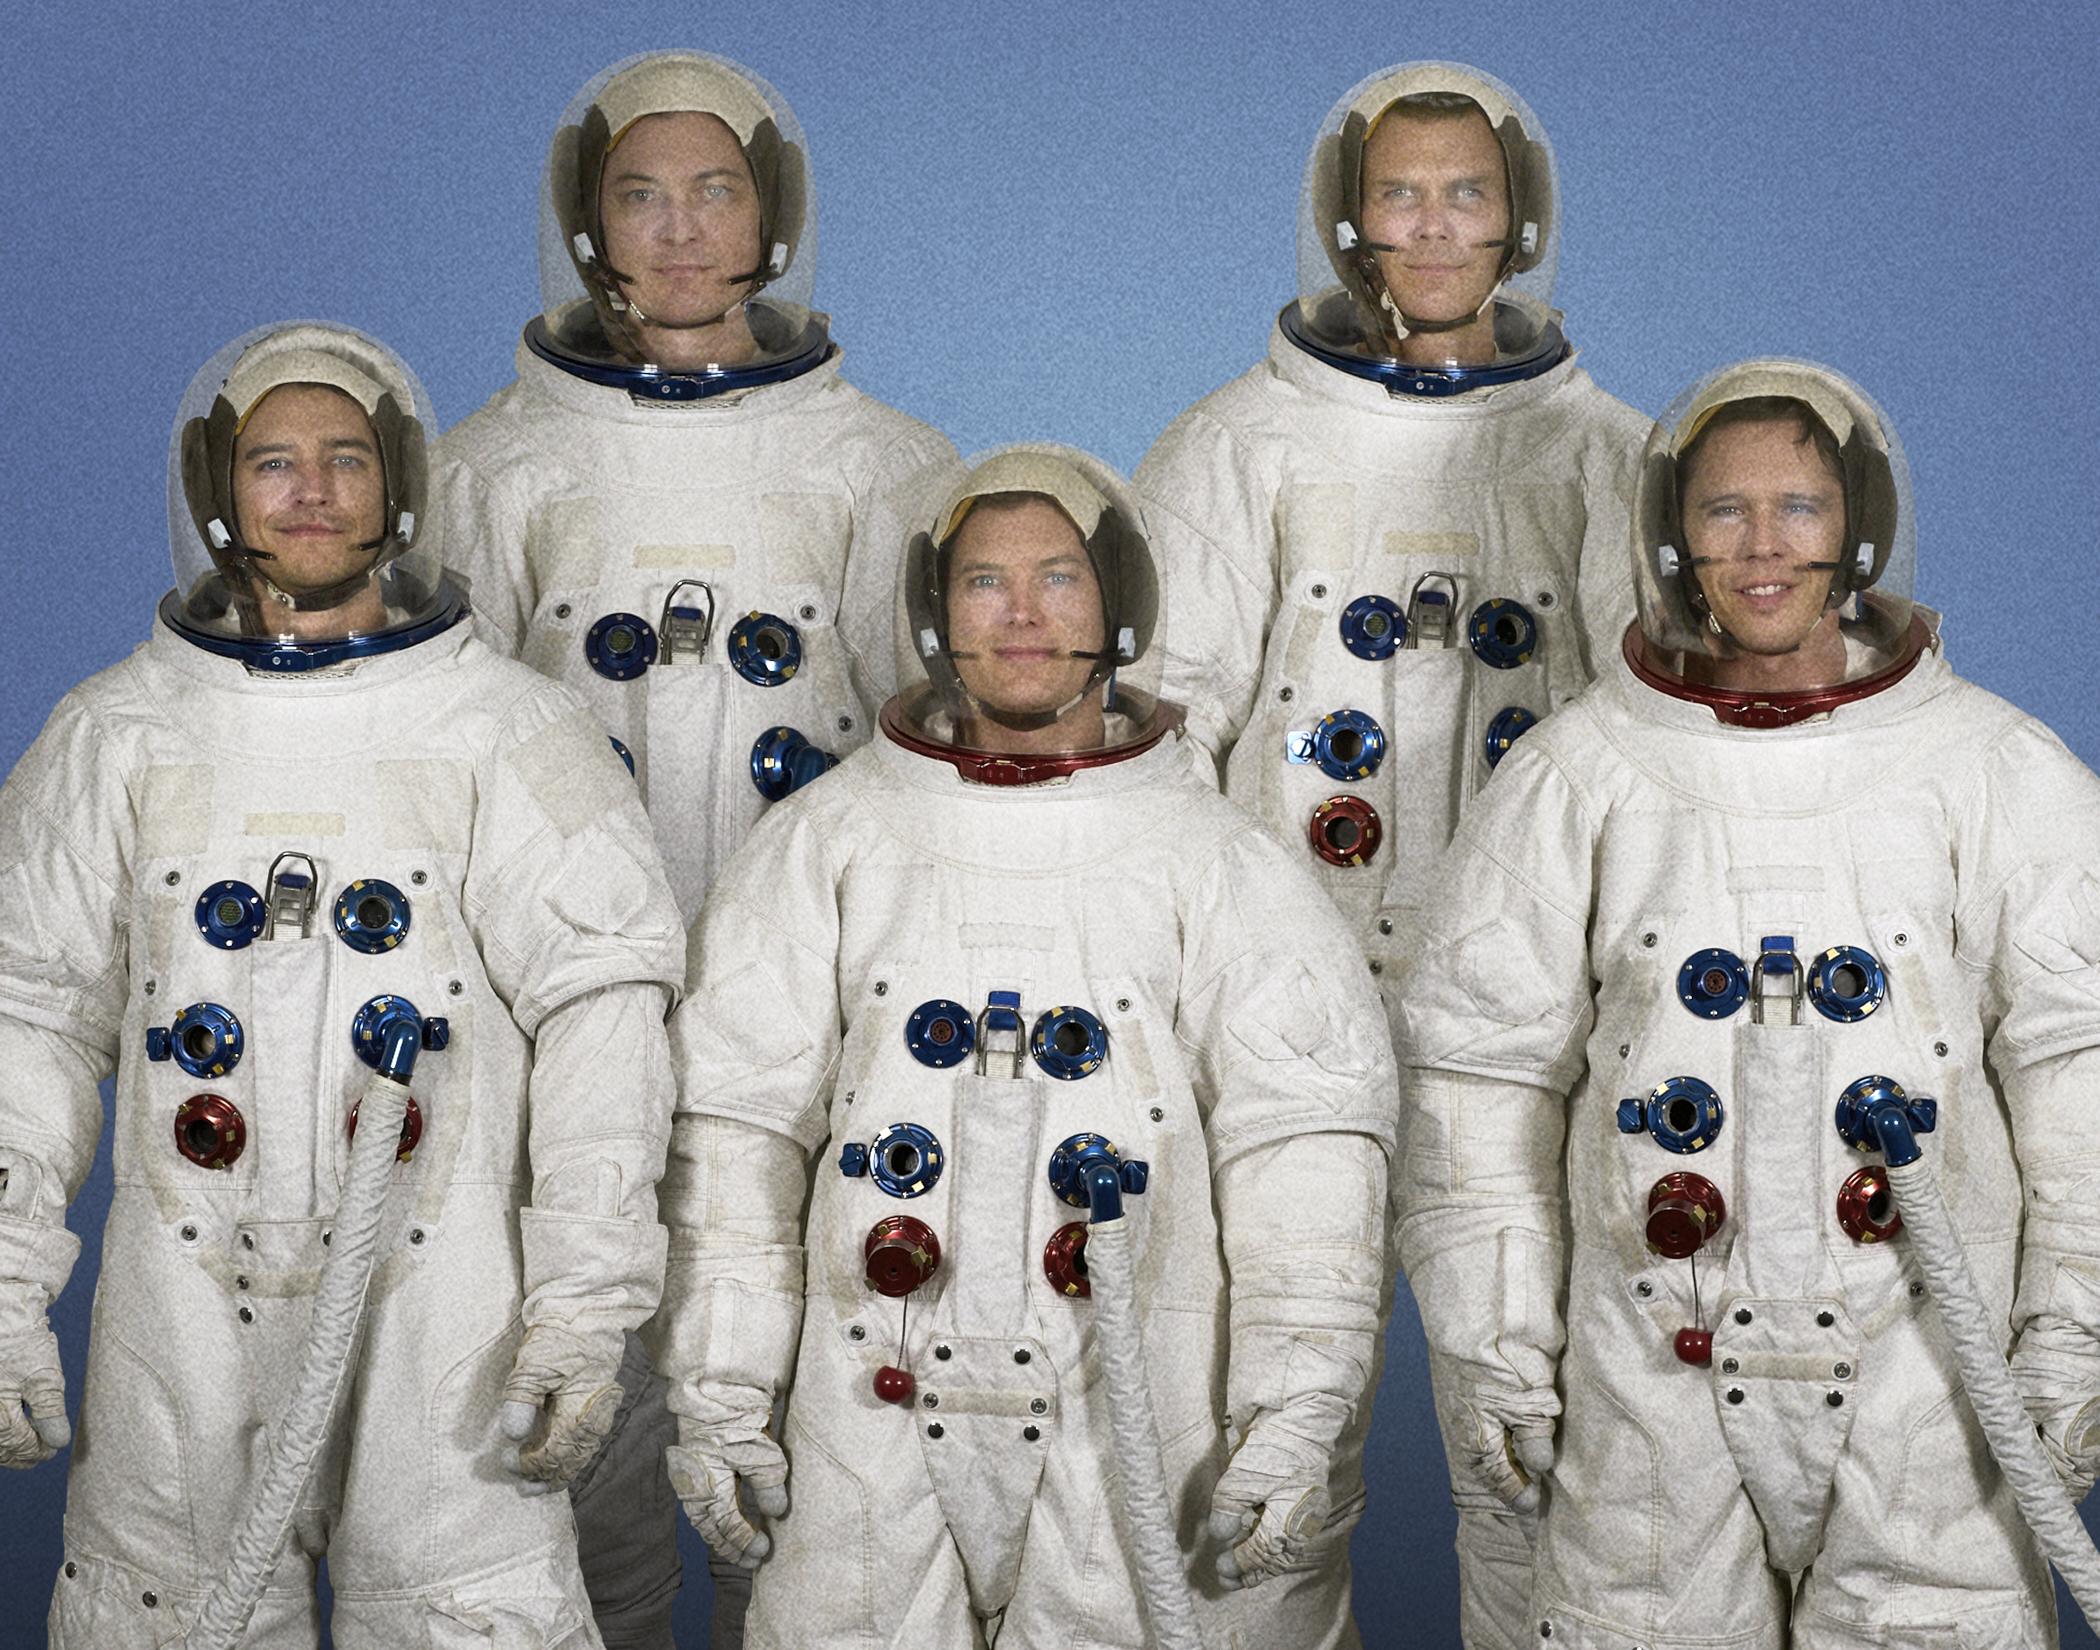 astronauts_50.jpg